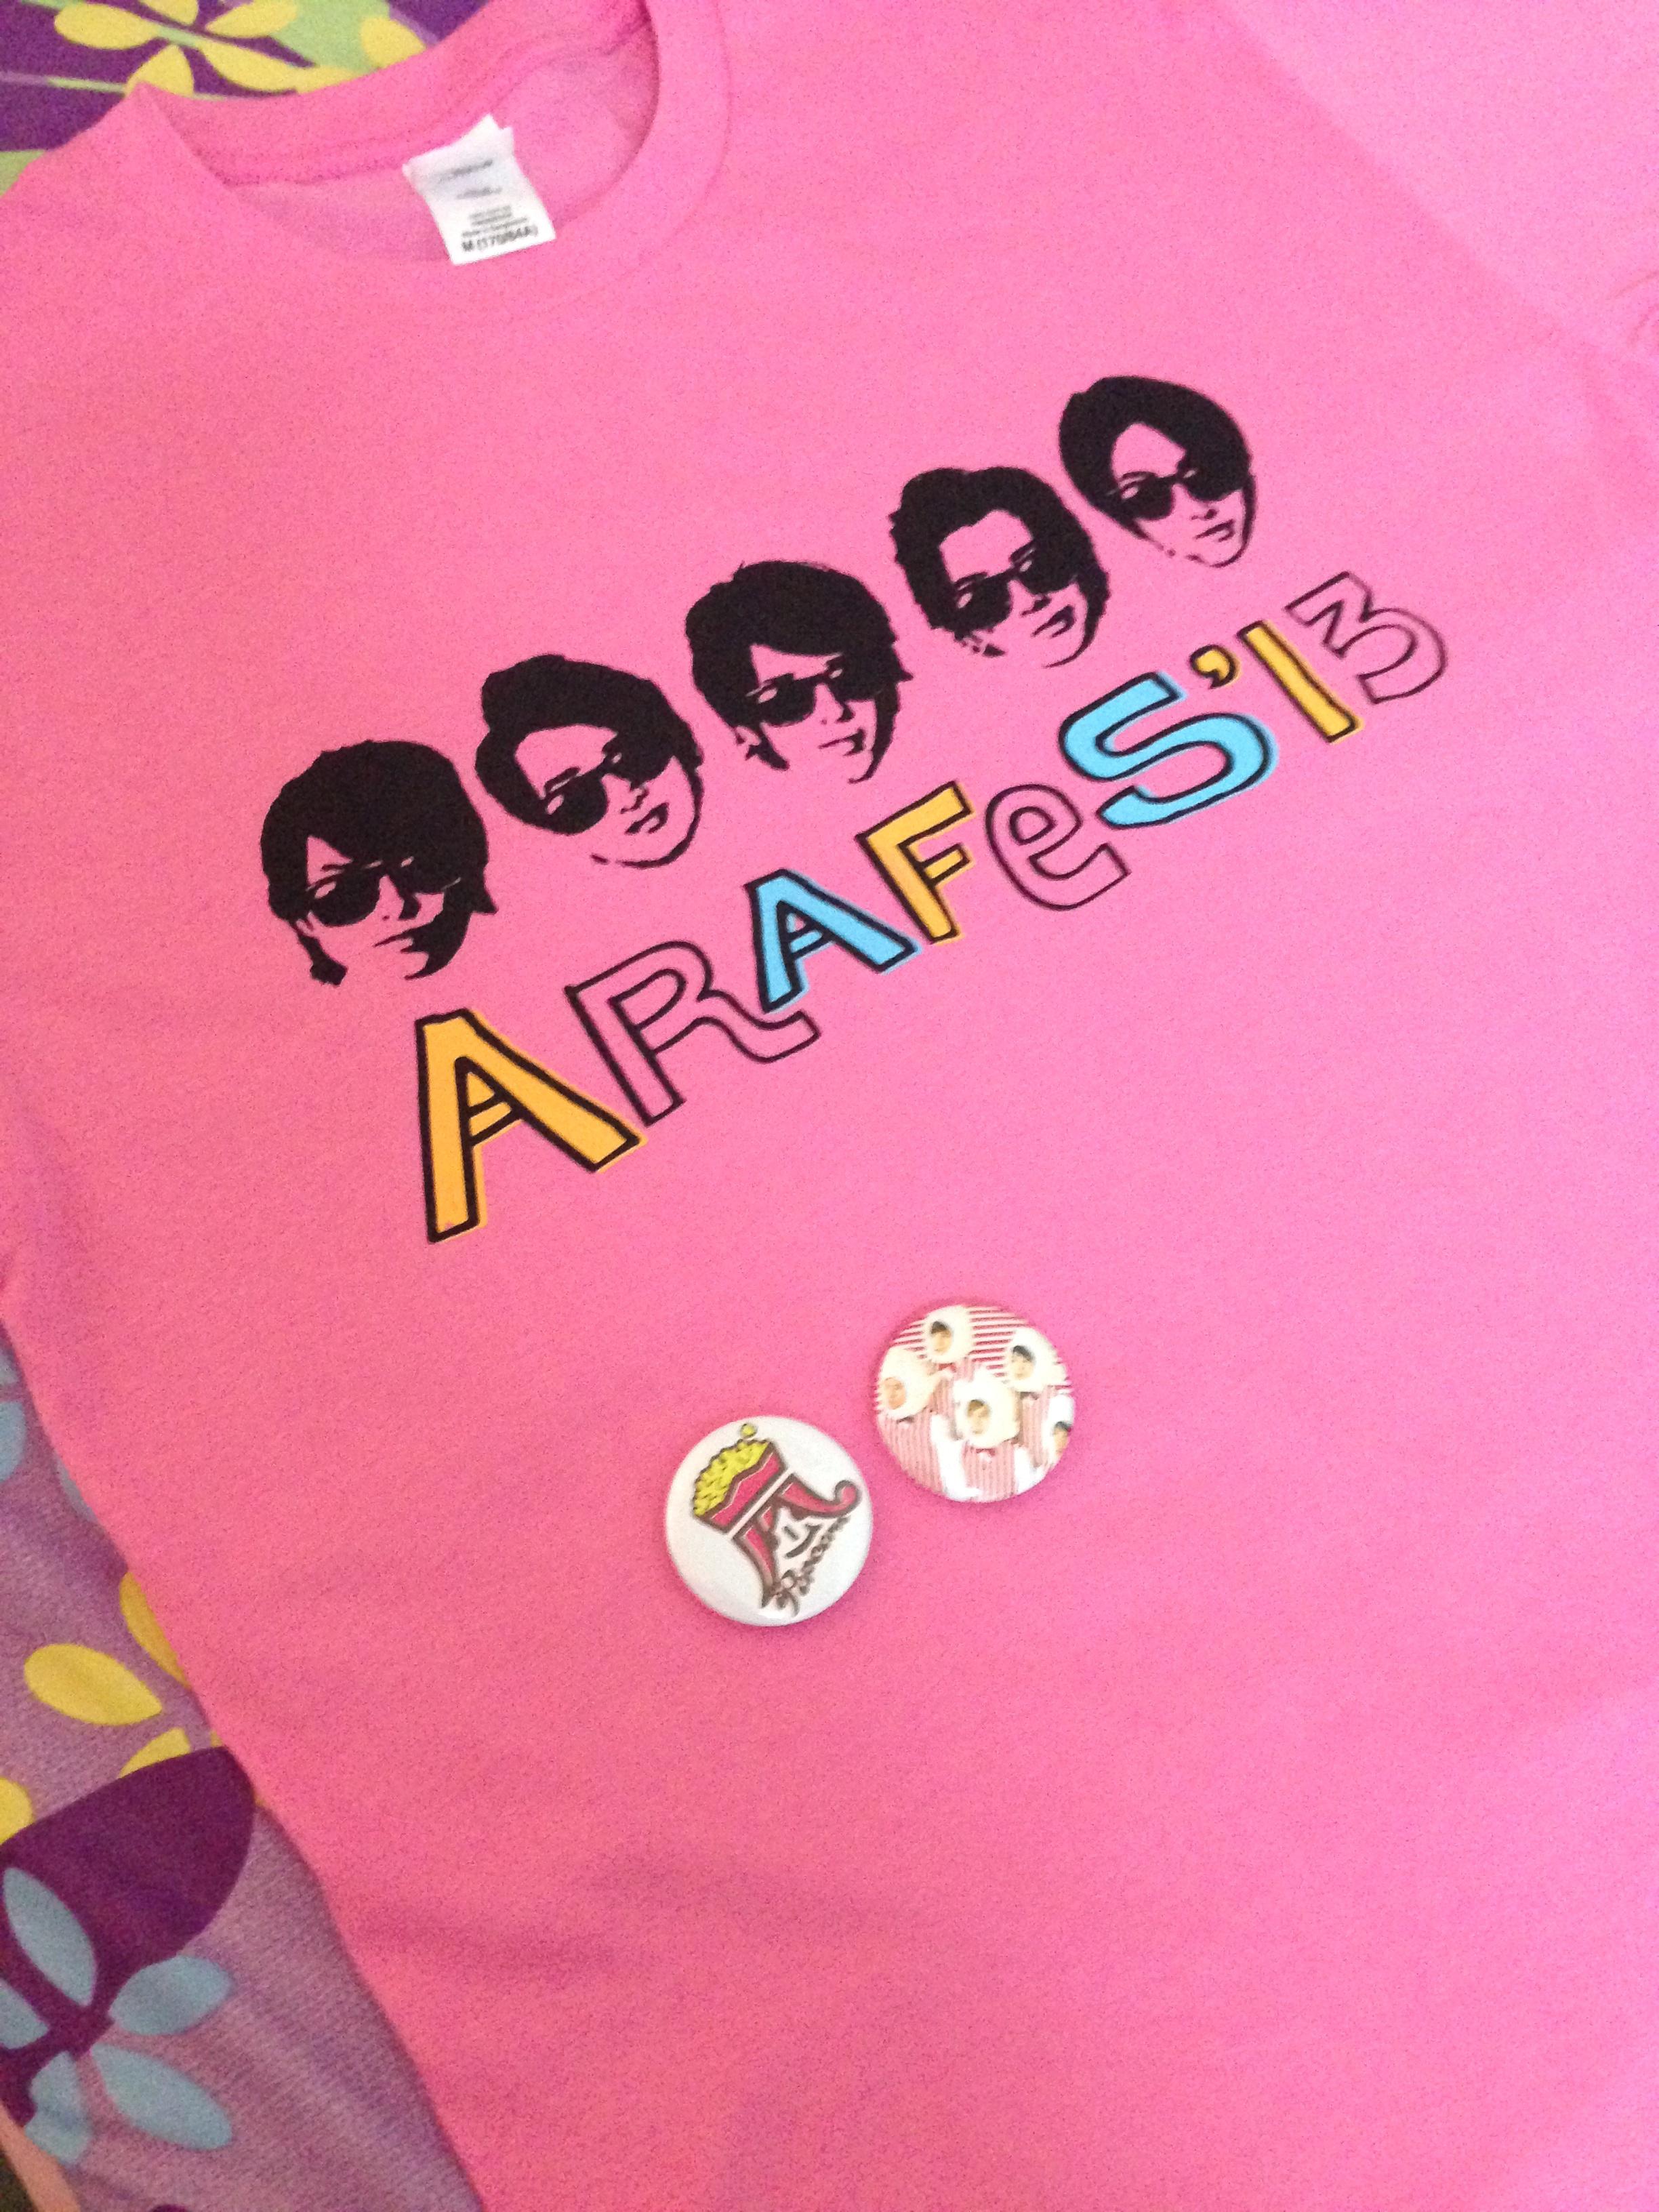 arafesshirt